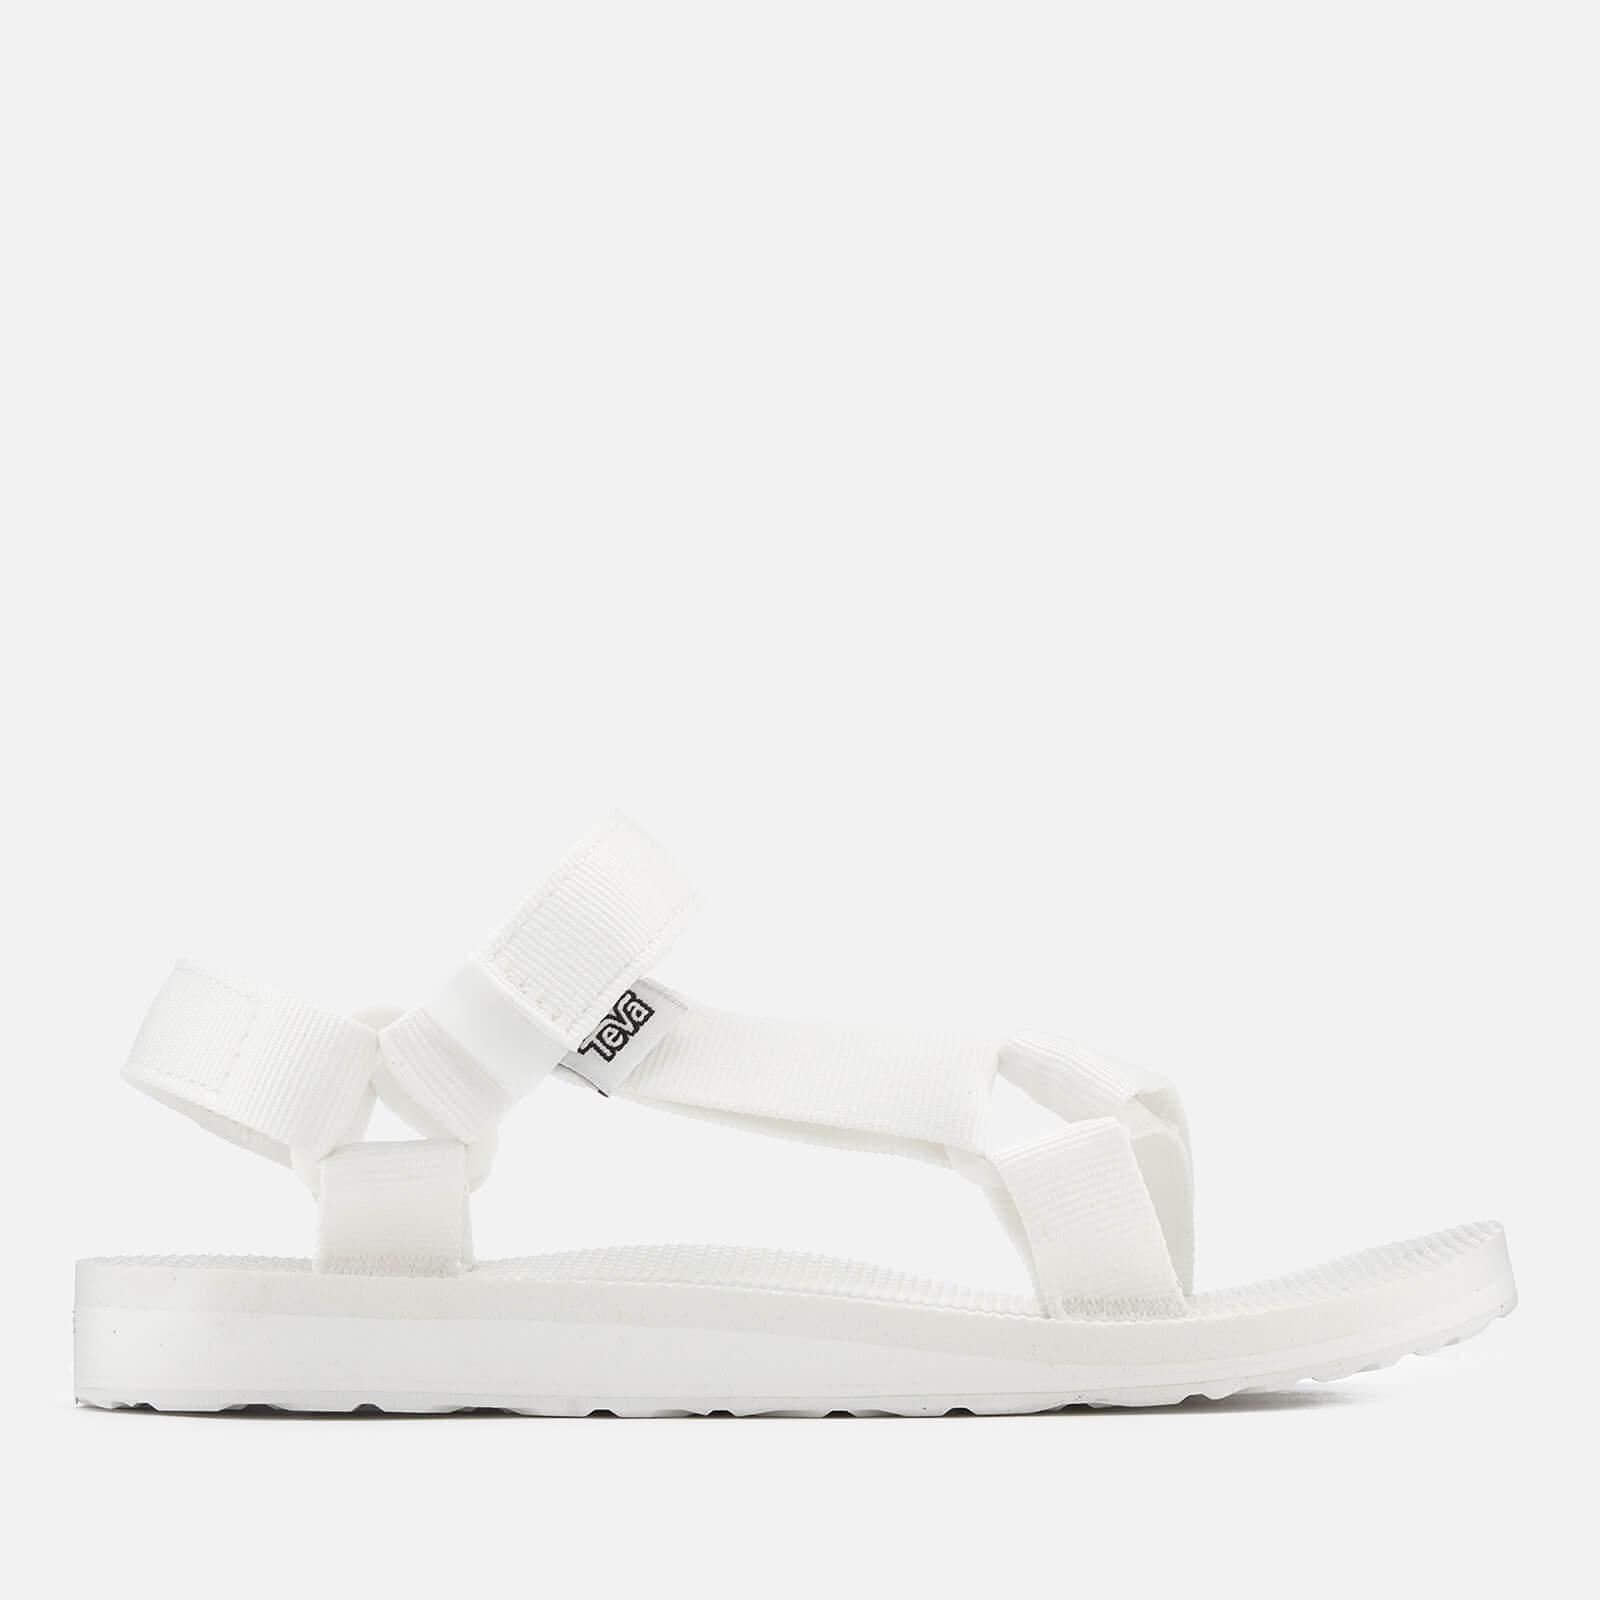 Teva Women's Original Universal Sport Sandals - Bright White - UK 7